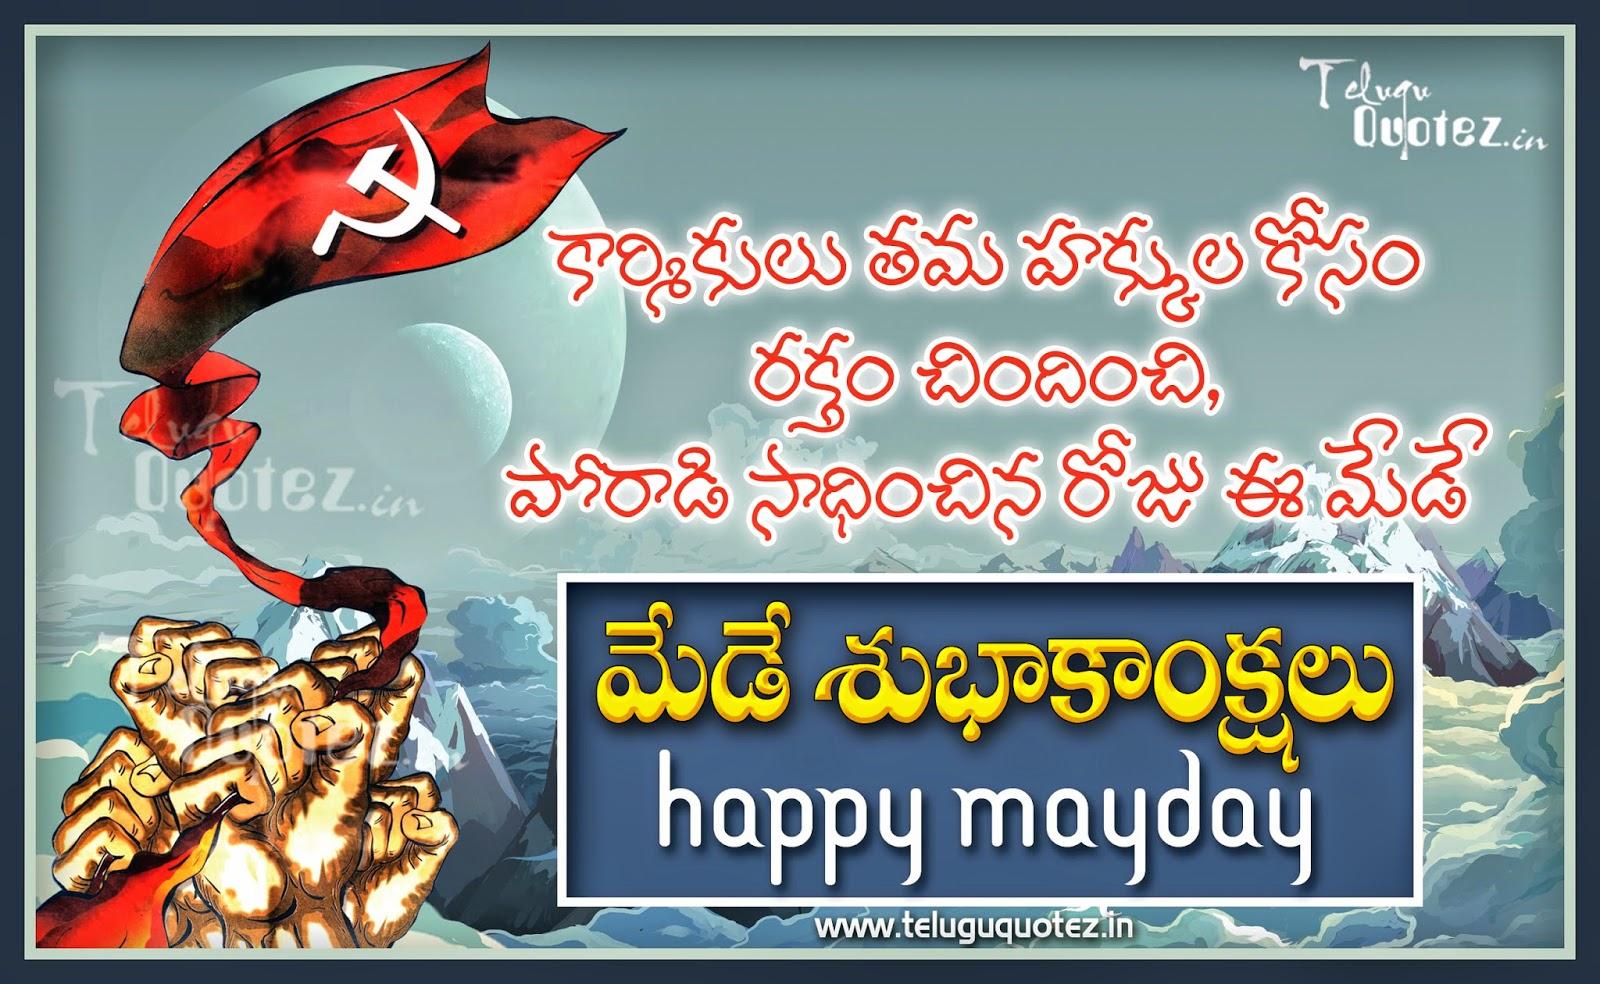 Mayday Telugu Quotes HD Wallpapers